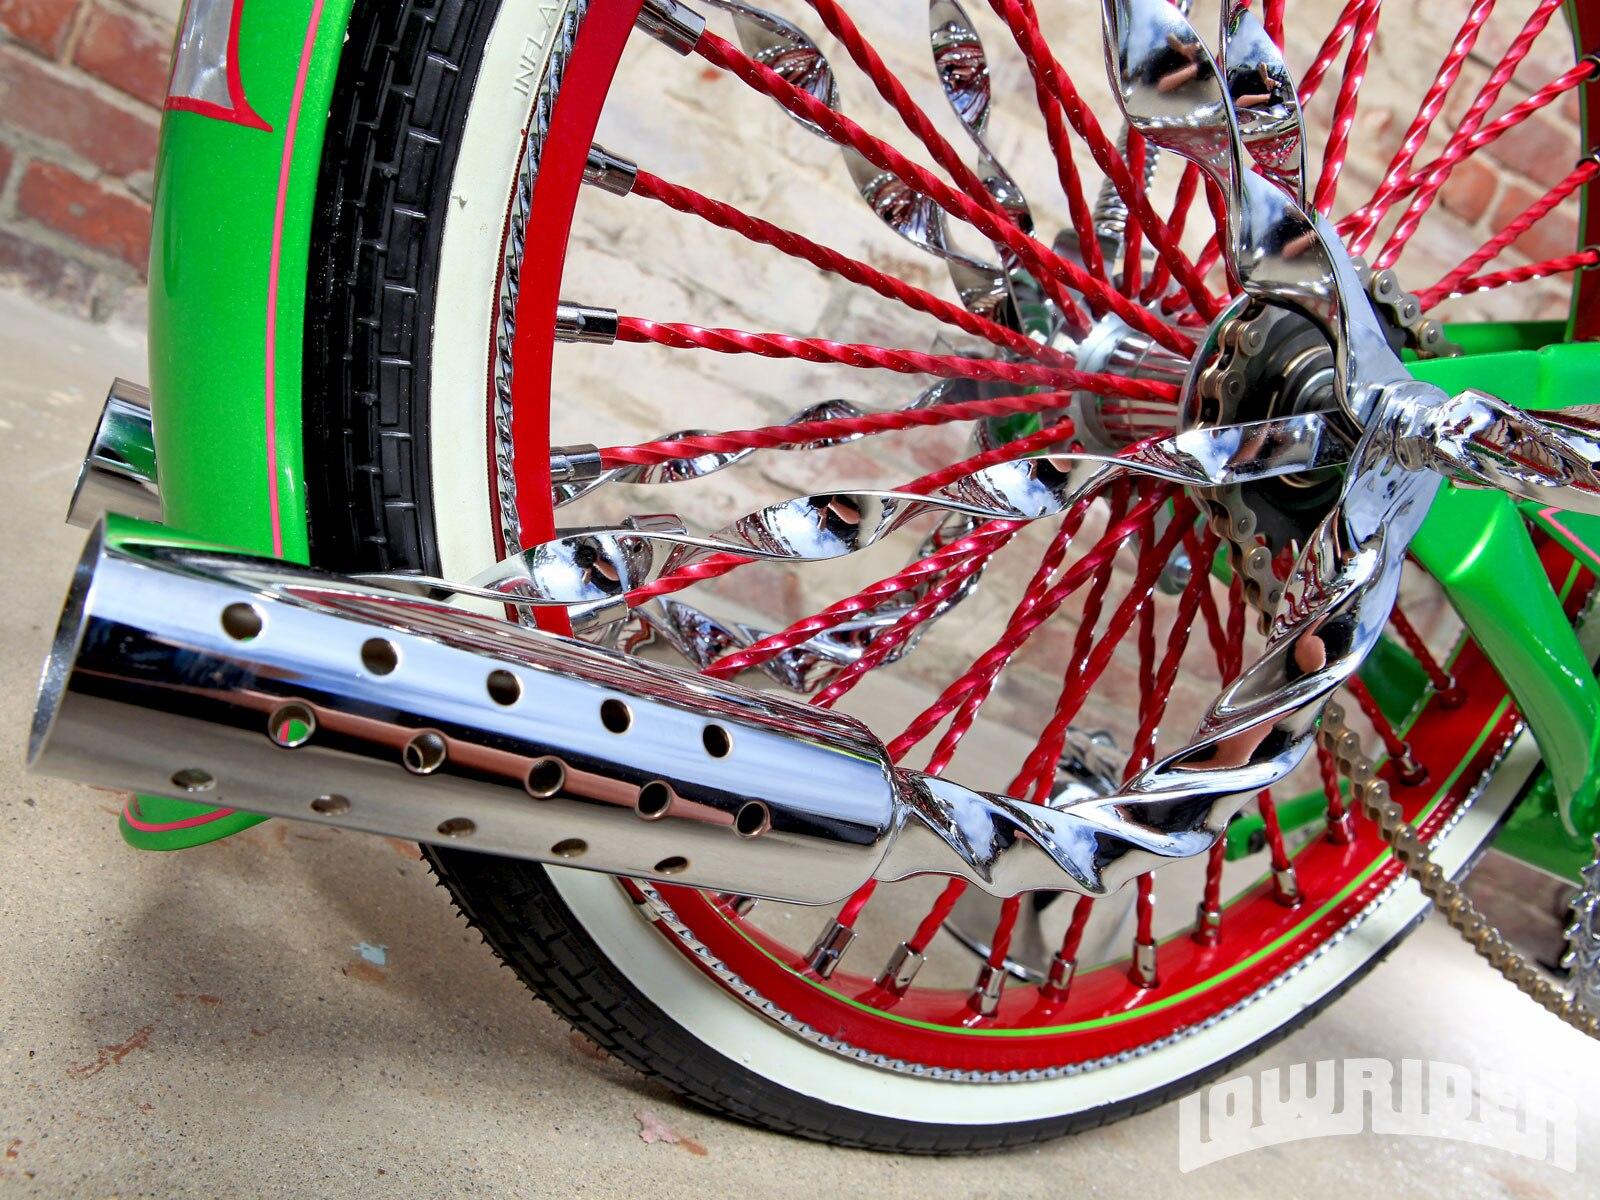 1212 Lrmp 07 O 2008 Huffy Bike Twisted Spoke Wheel Lowrider